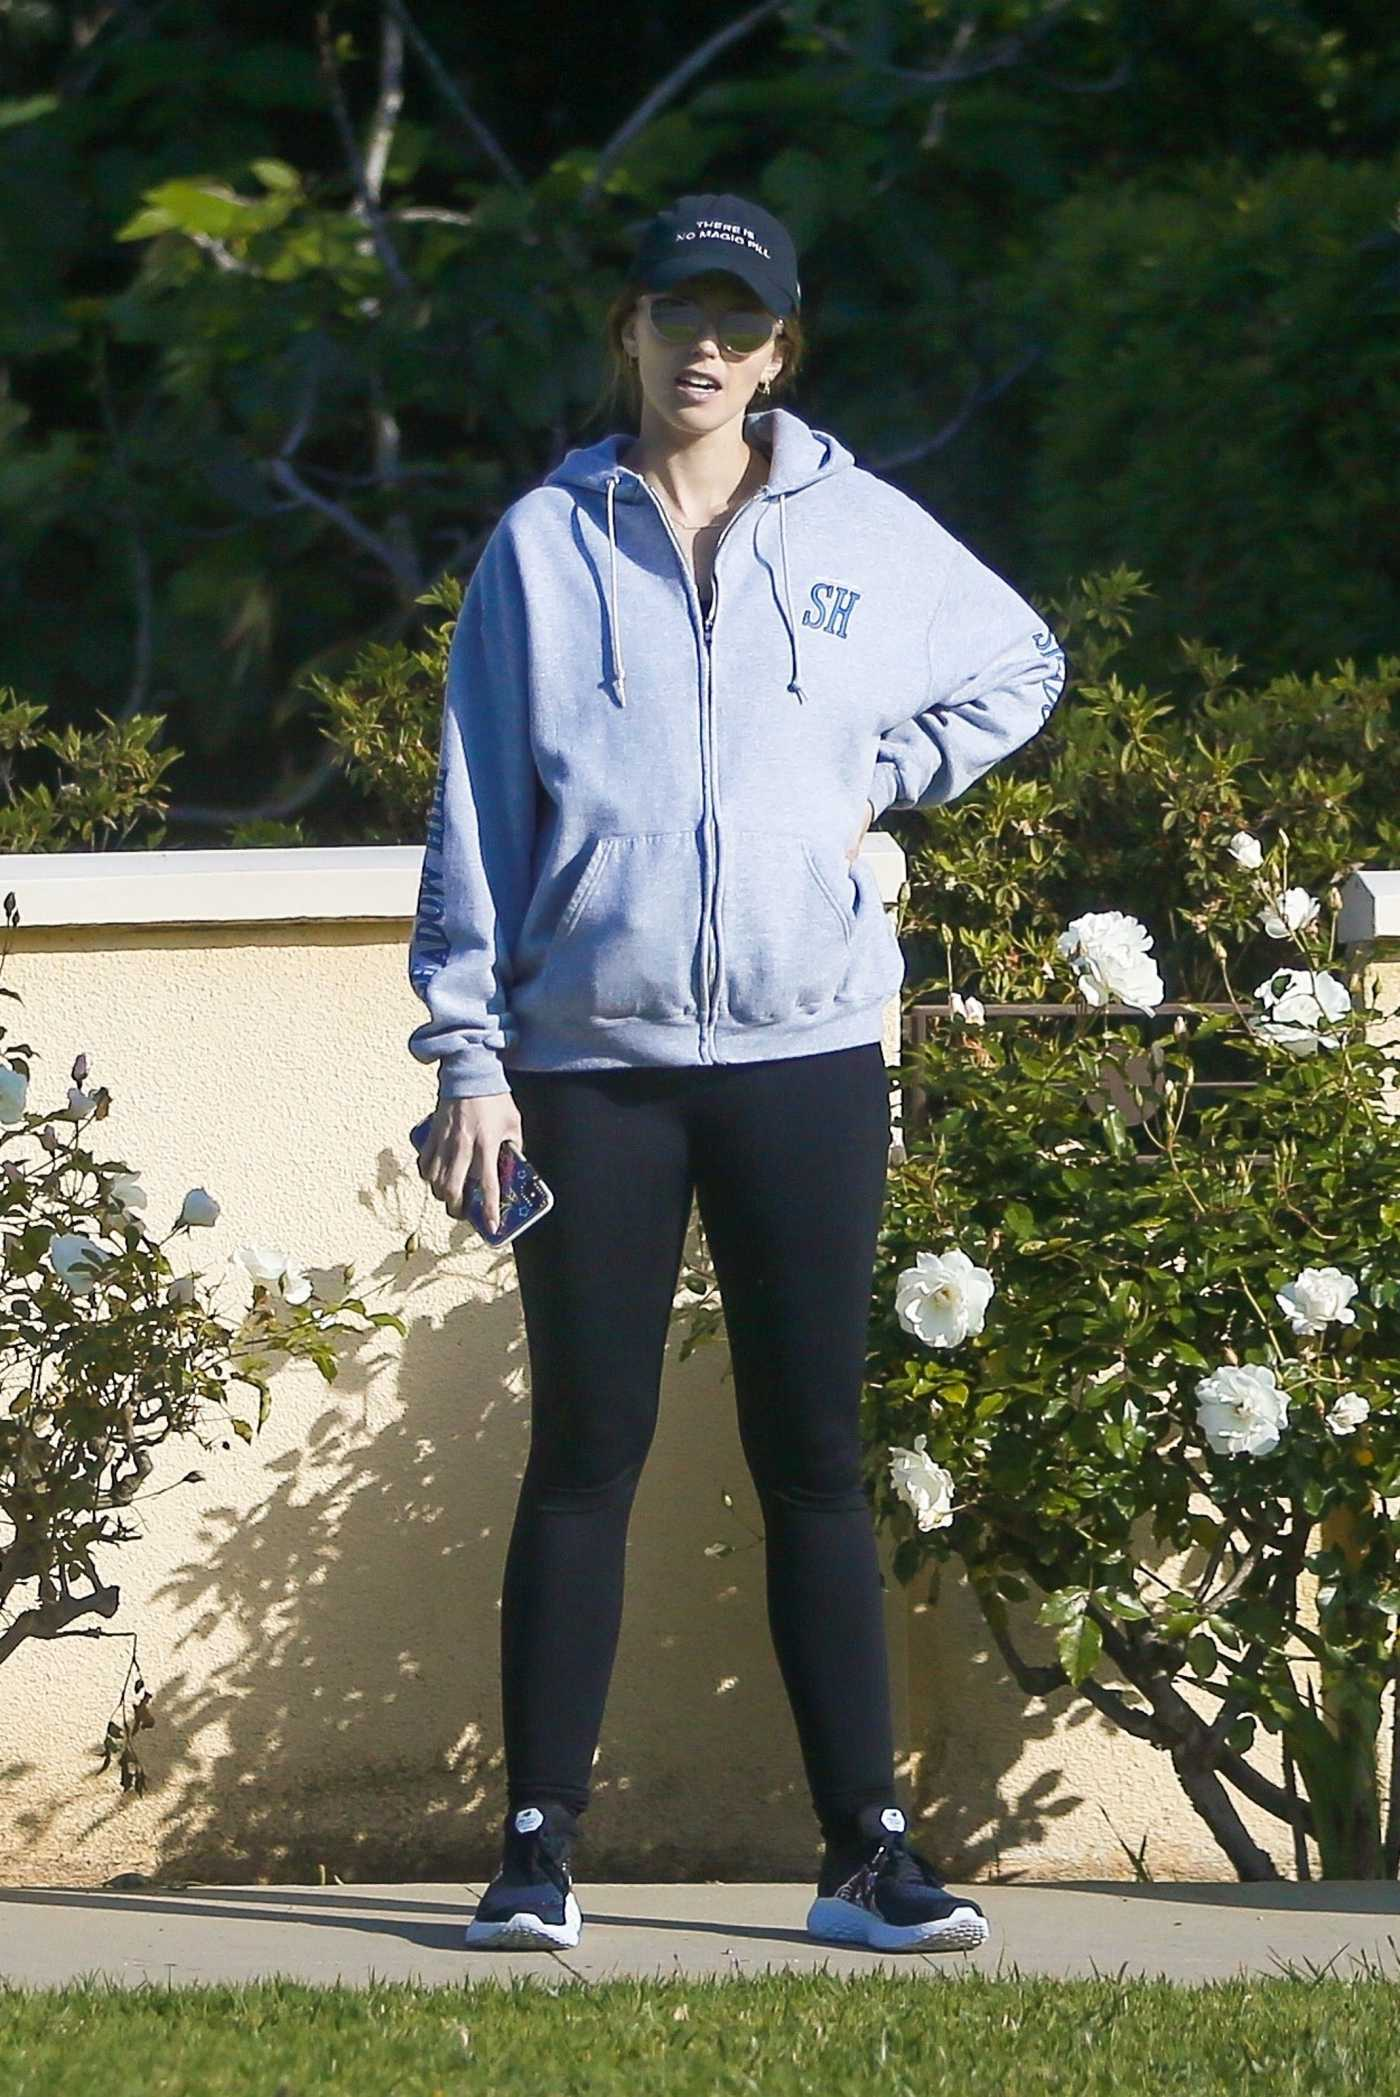 Katherine Schwarzenegger in a Black Cap Was Seen Out with Chris Pratt in Santa Monica 04/25/2020